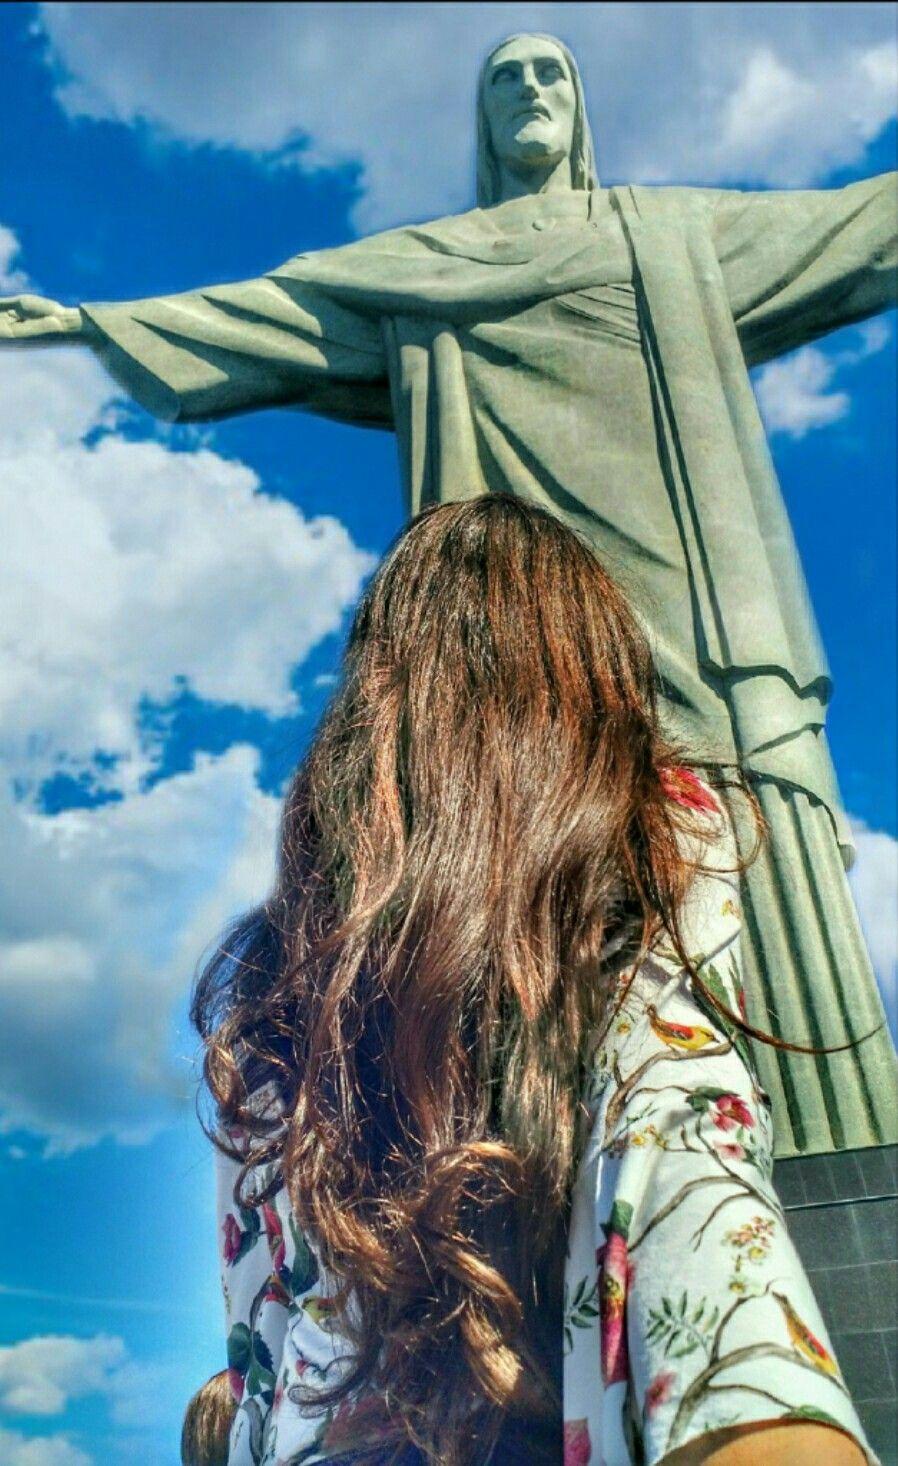 Foto Tumblr No Cristo Redentor Rj Instagram Natashapomponet Cristo Redentor Cristo Redentor Rj Rio De Janeiro Lapa